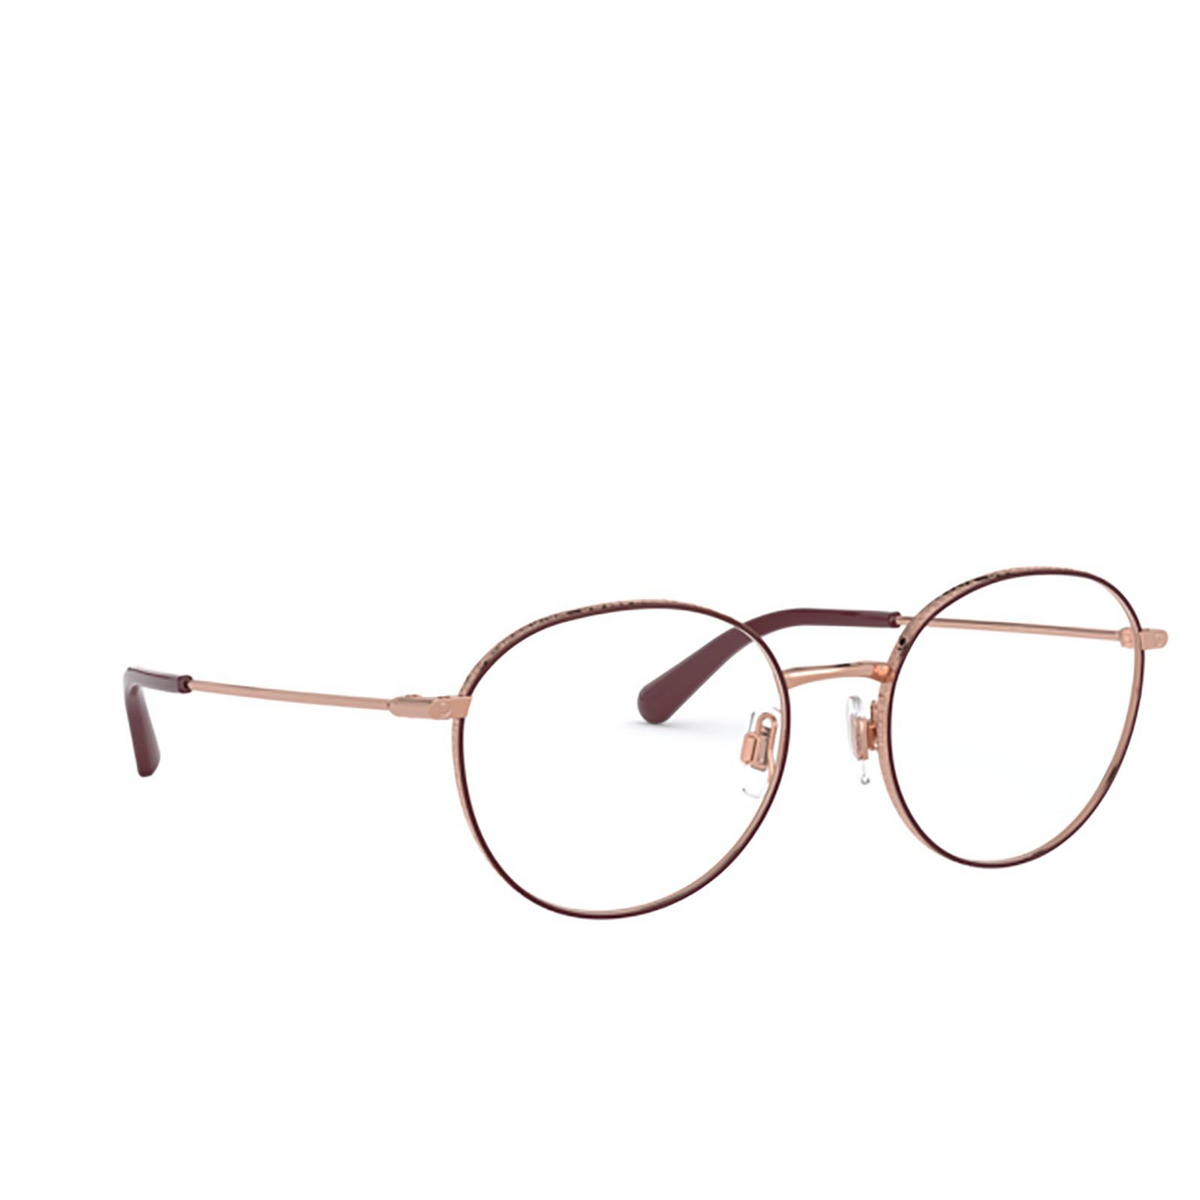 Dolce & Gabbana® Round Eyeglasses: DG1322 color Pink Gold / Bordeaux 1333 - three-quarters view.